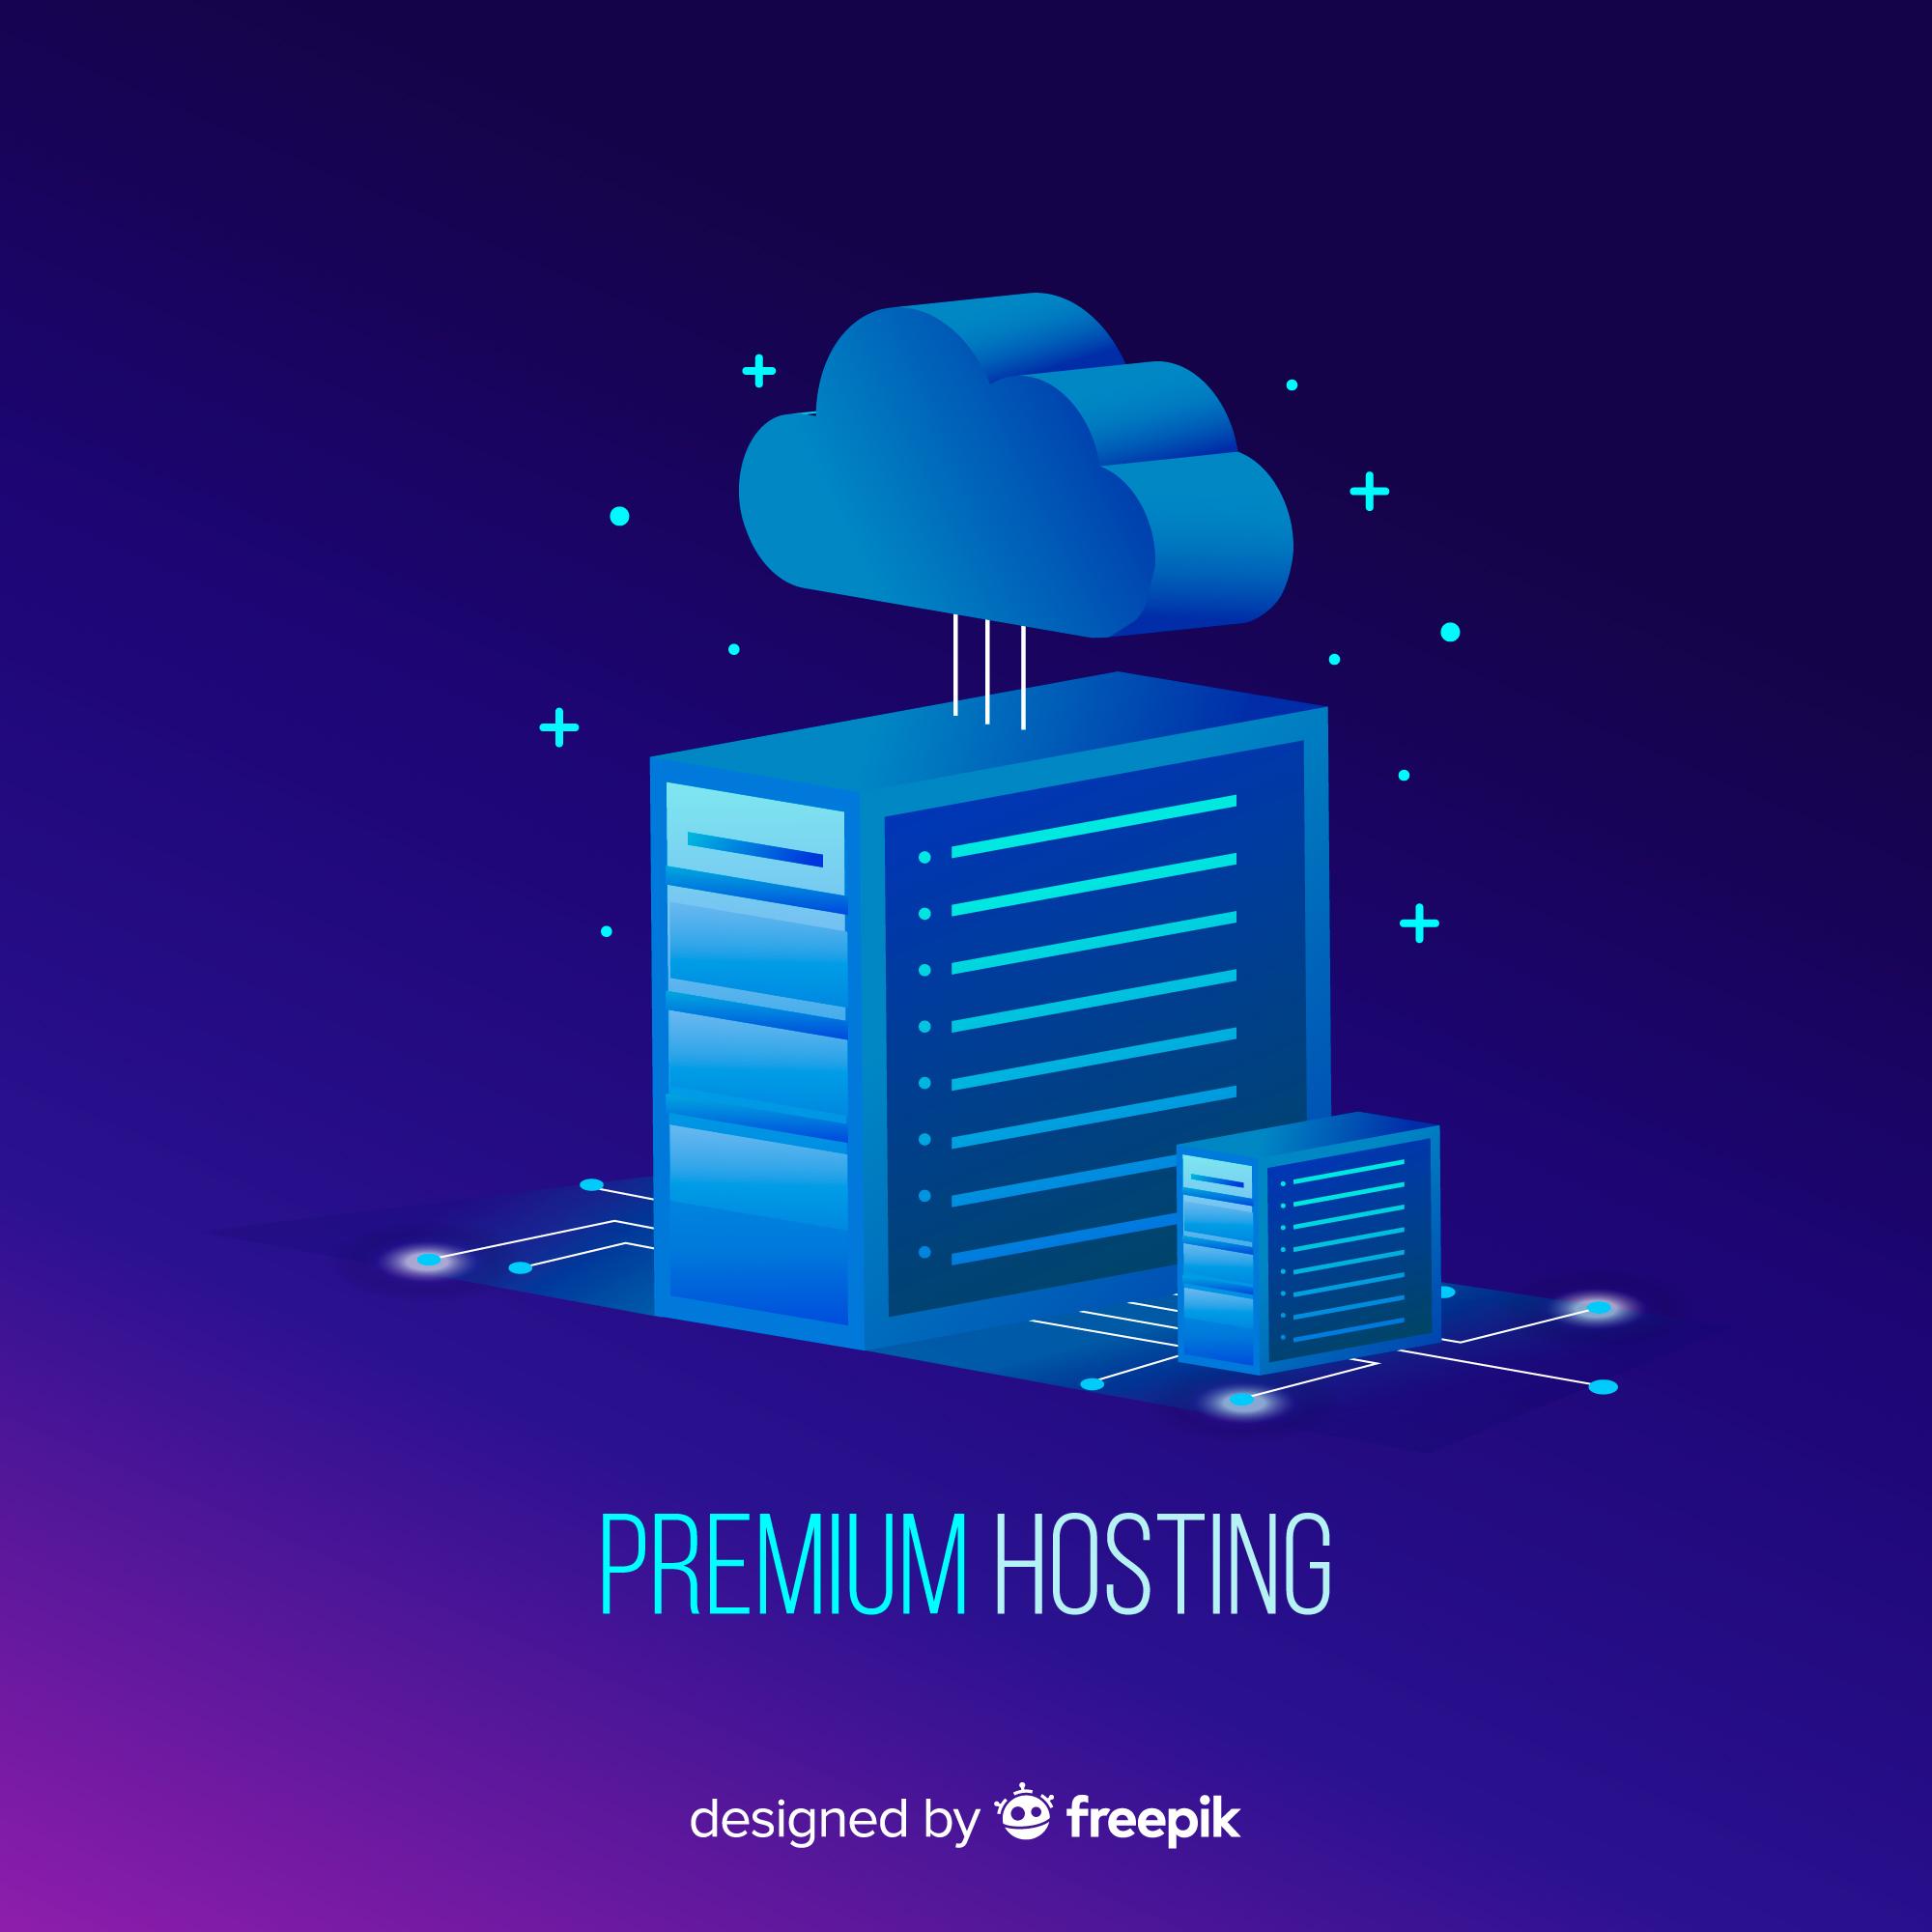 illustration of data server with premium or paid ssl hosting